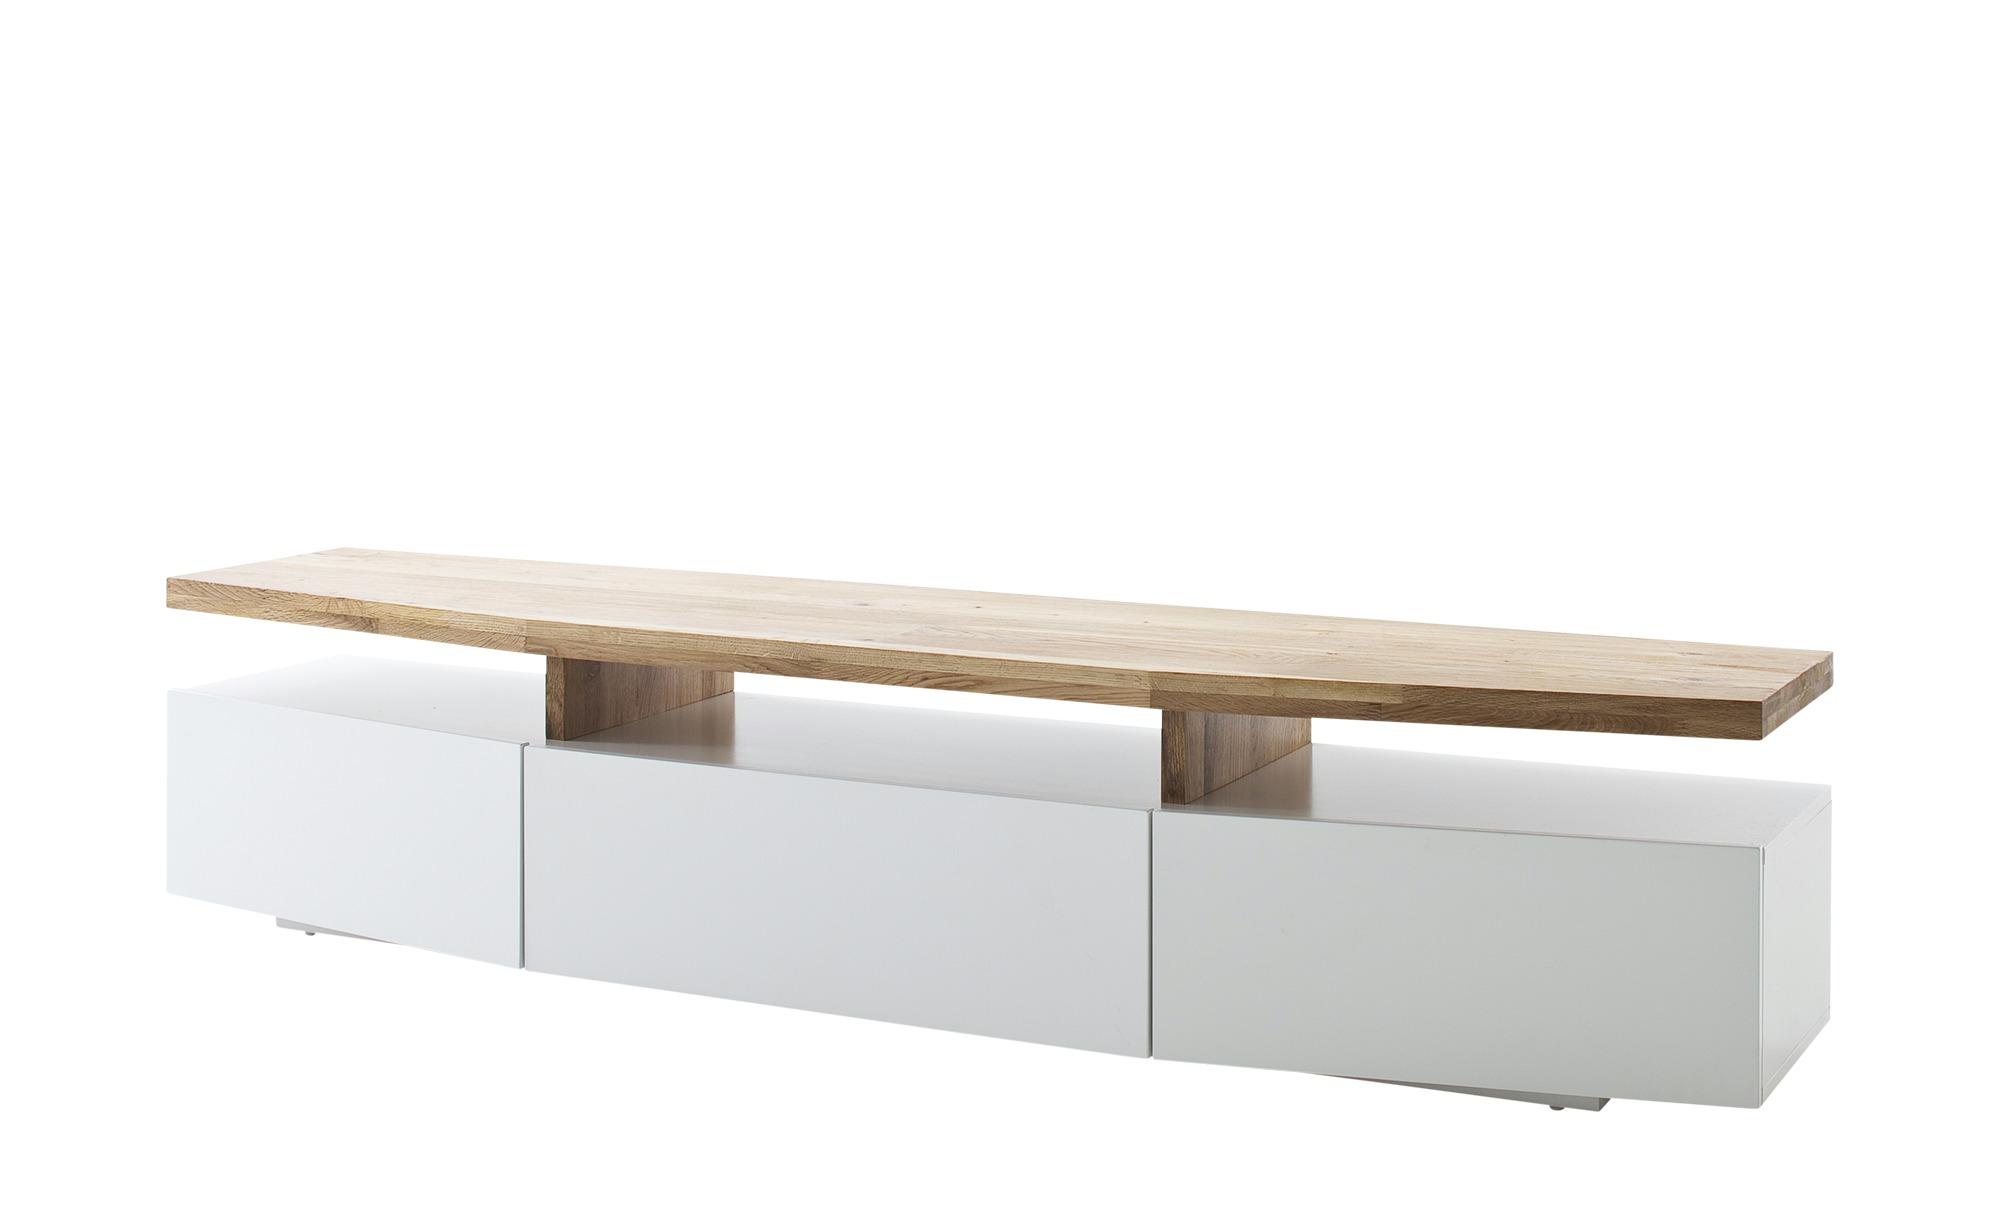 Tv Lowboard Lazise Weiß Maße Cm B 180 H 39 T 40 Tv